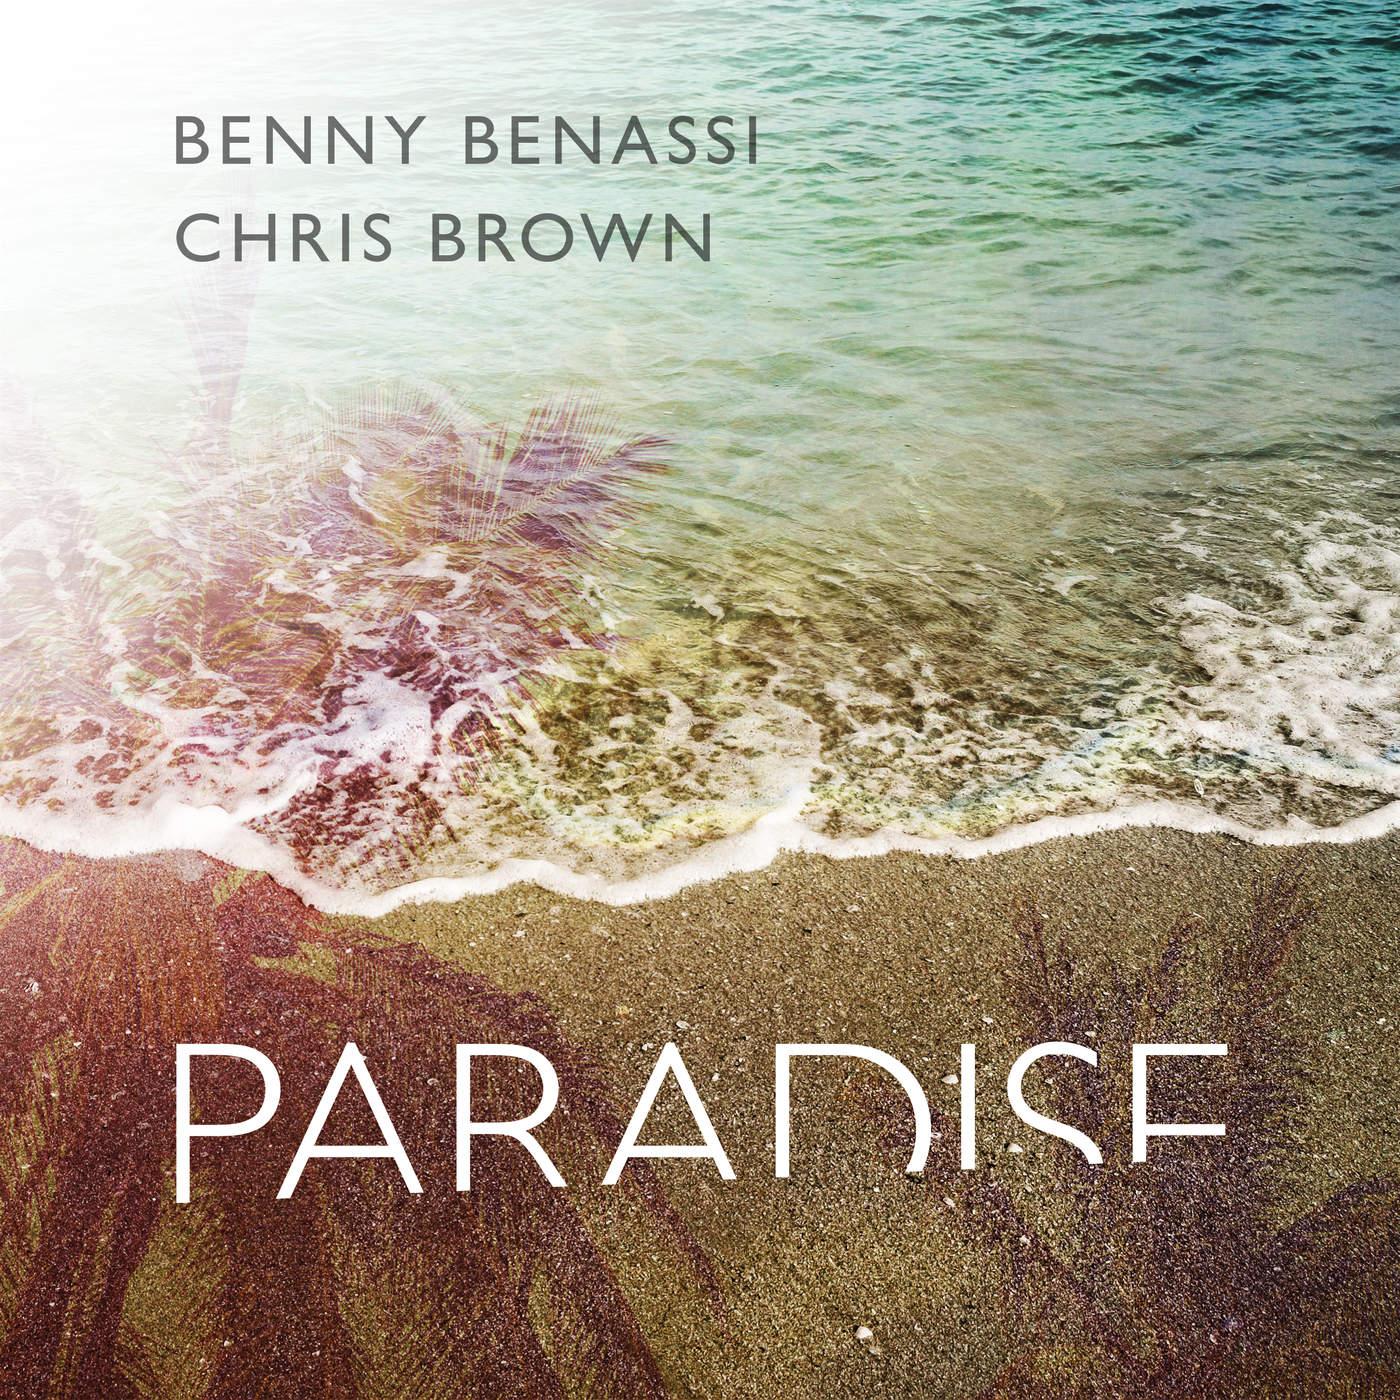 Benny Benassi & Chris Brown - Paradise (Radio Edit) - Single